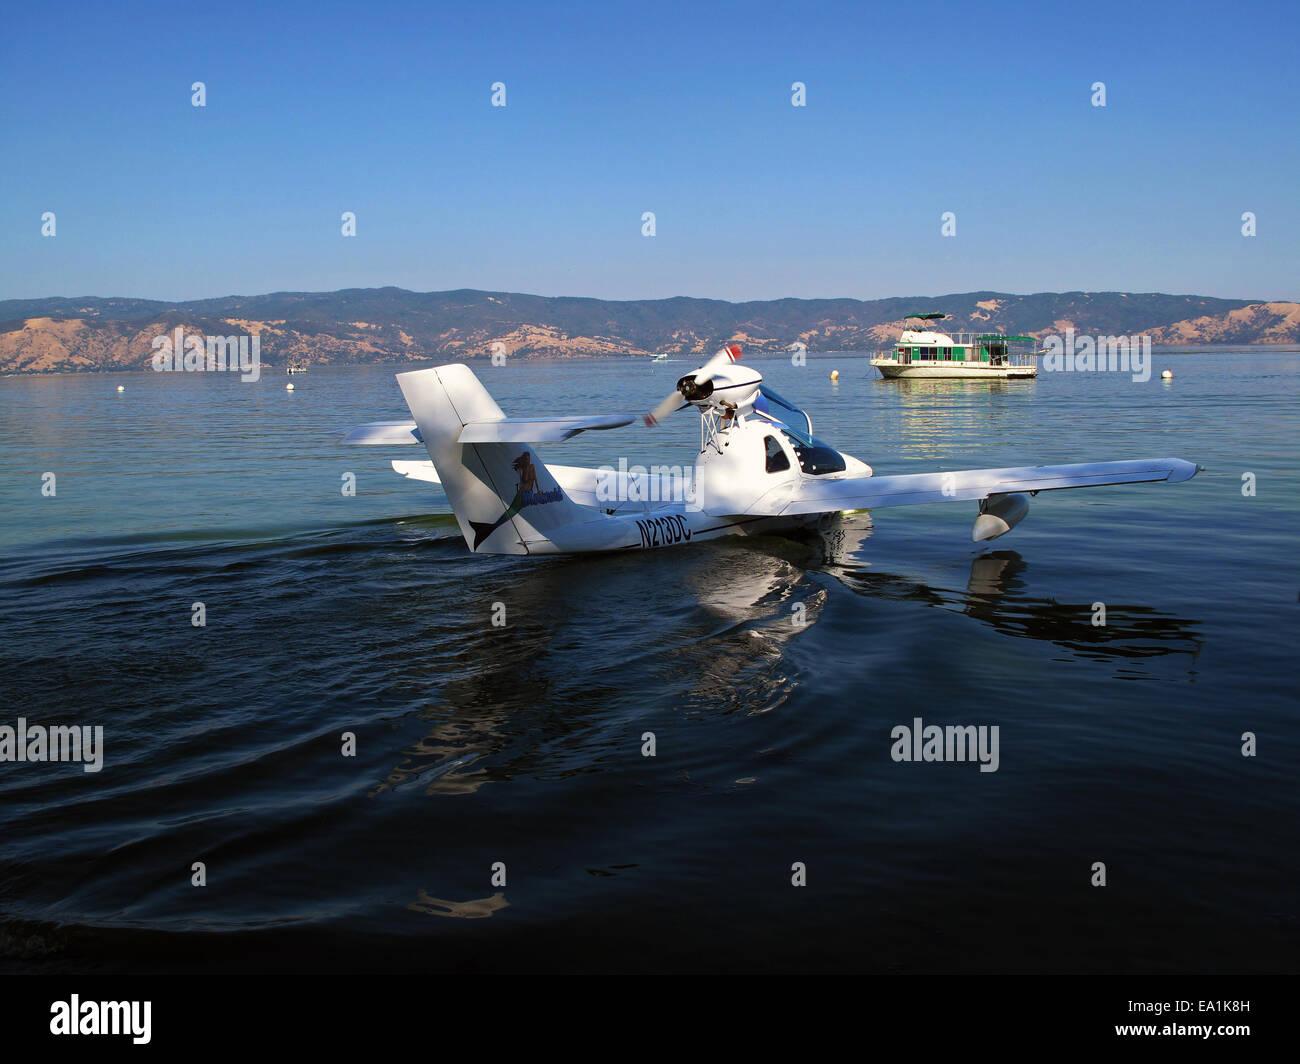 Czech Aircraft Works Mermaid Seaplane at the Splash-In, Lakeport, California, Lake County, California - Stock Image